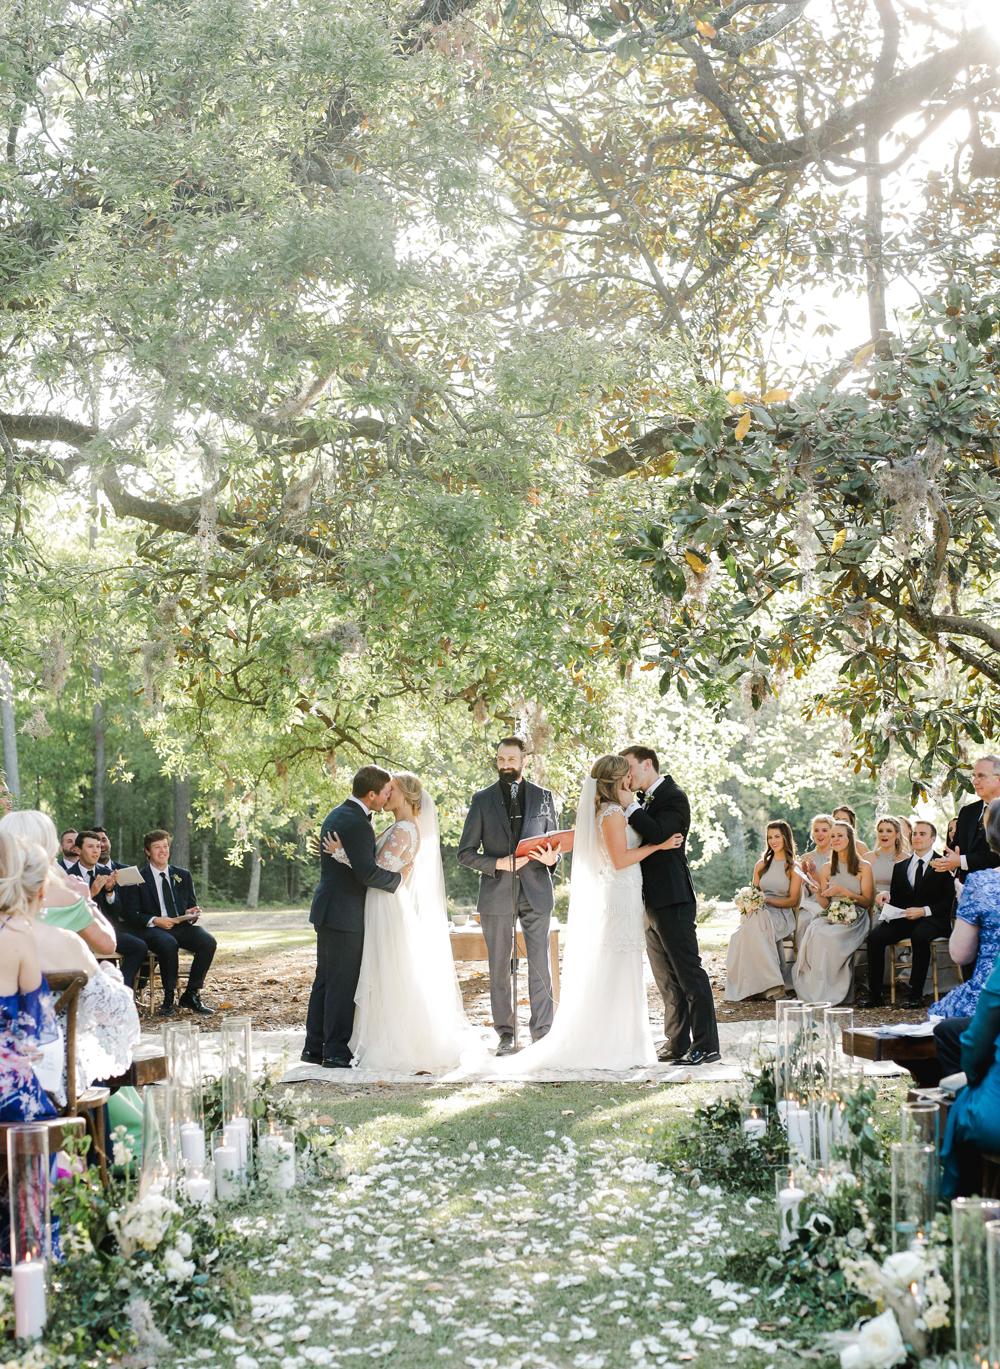 double wedding ceremony couples kissing